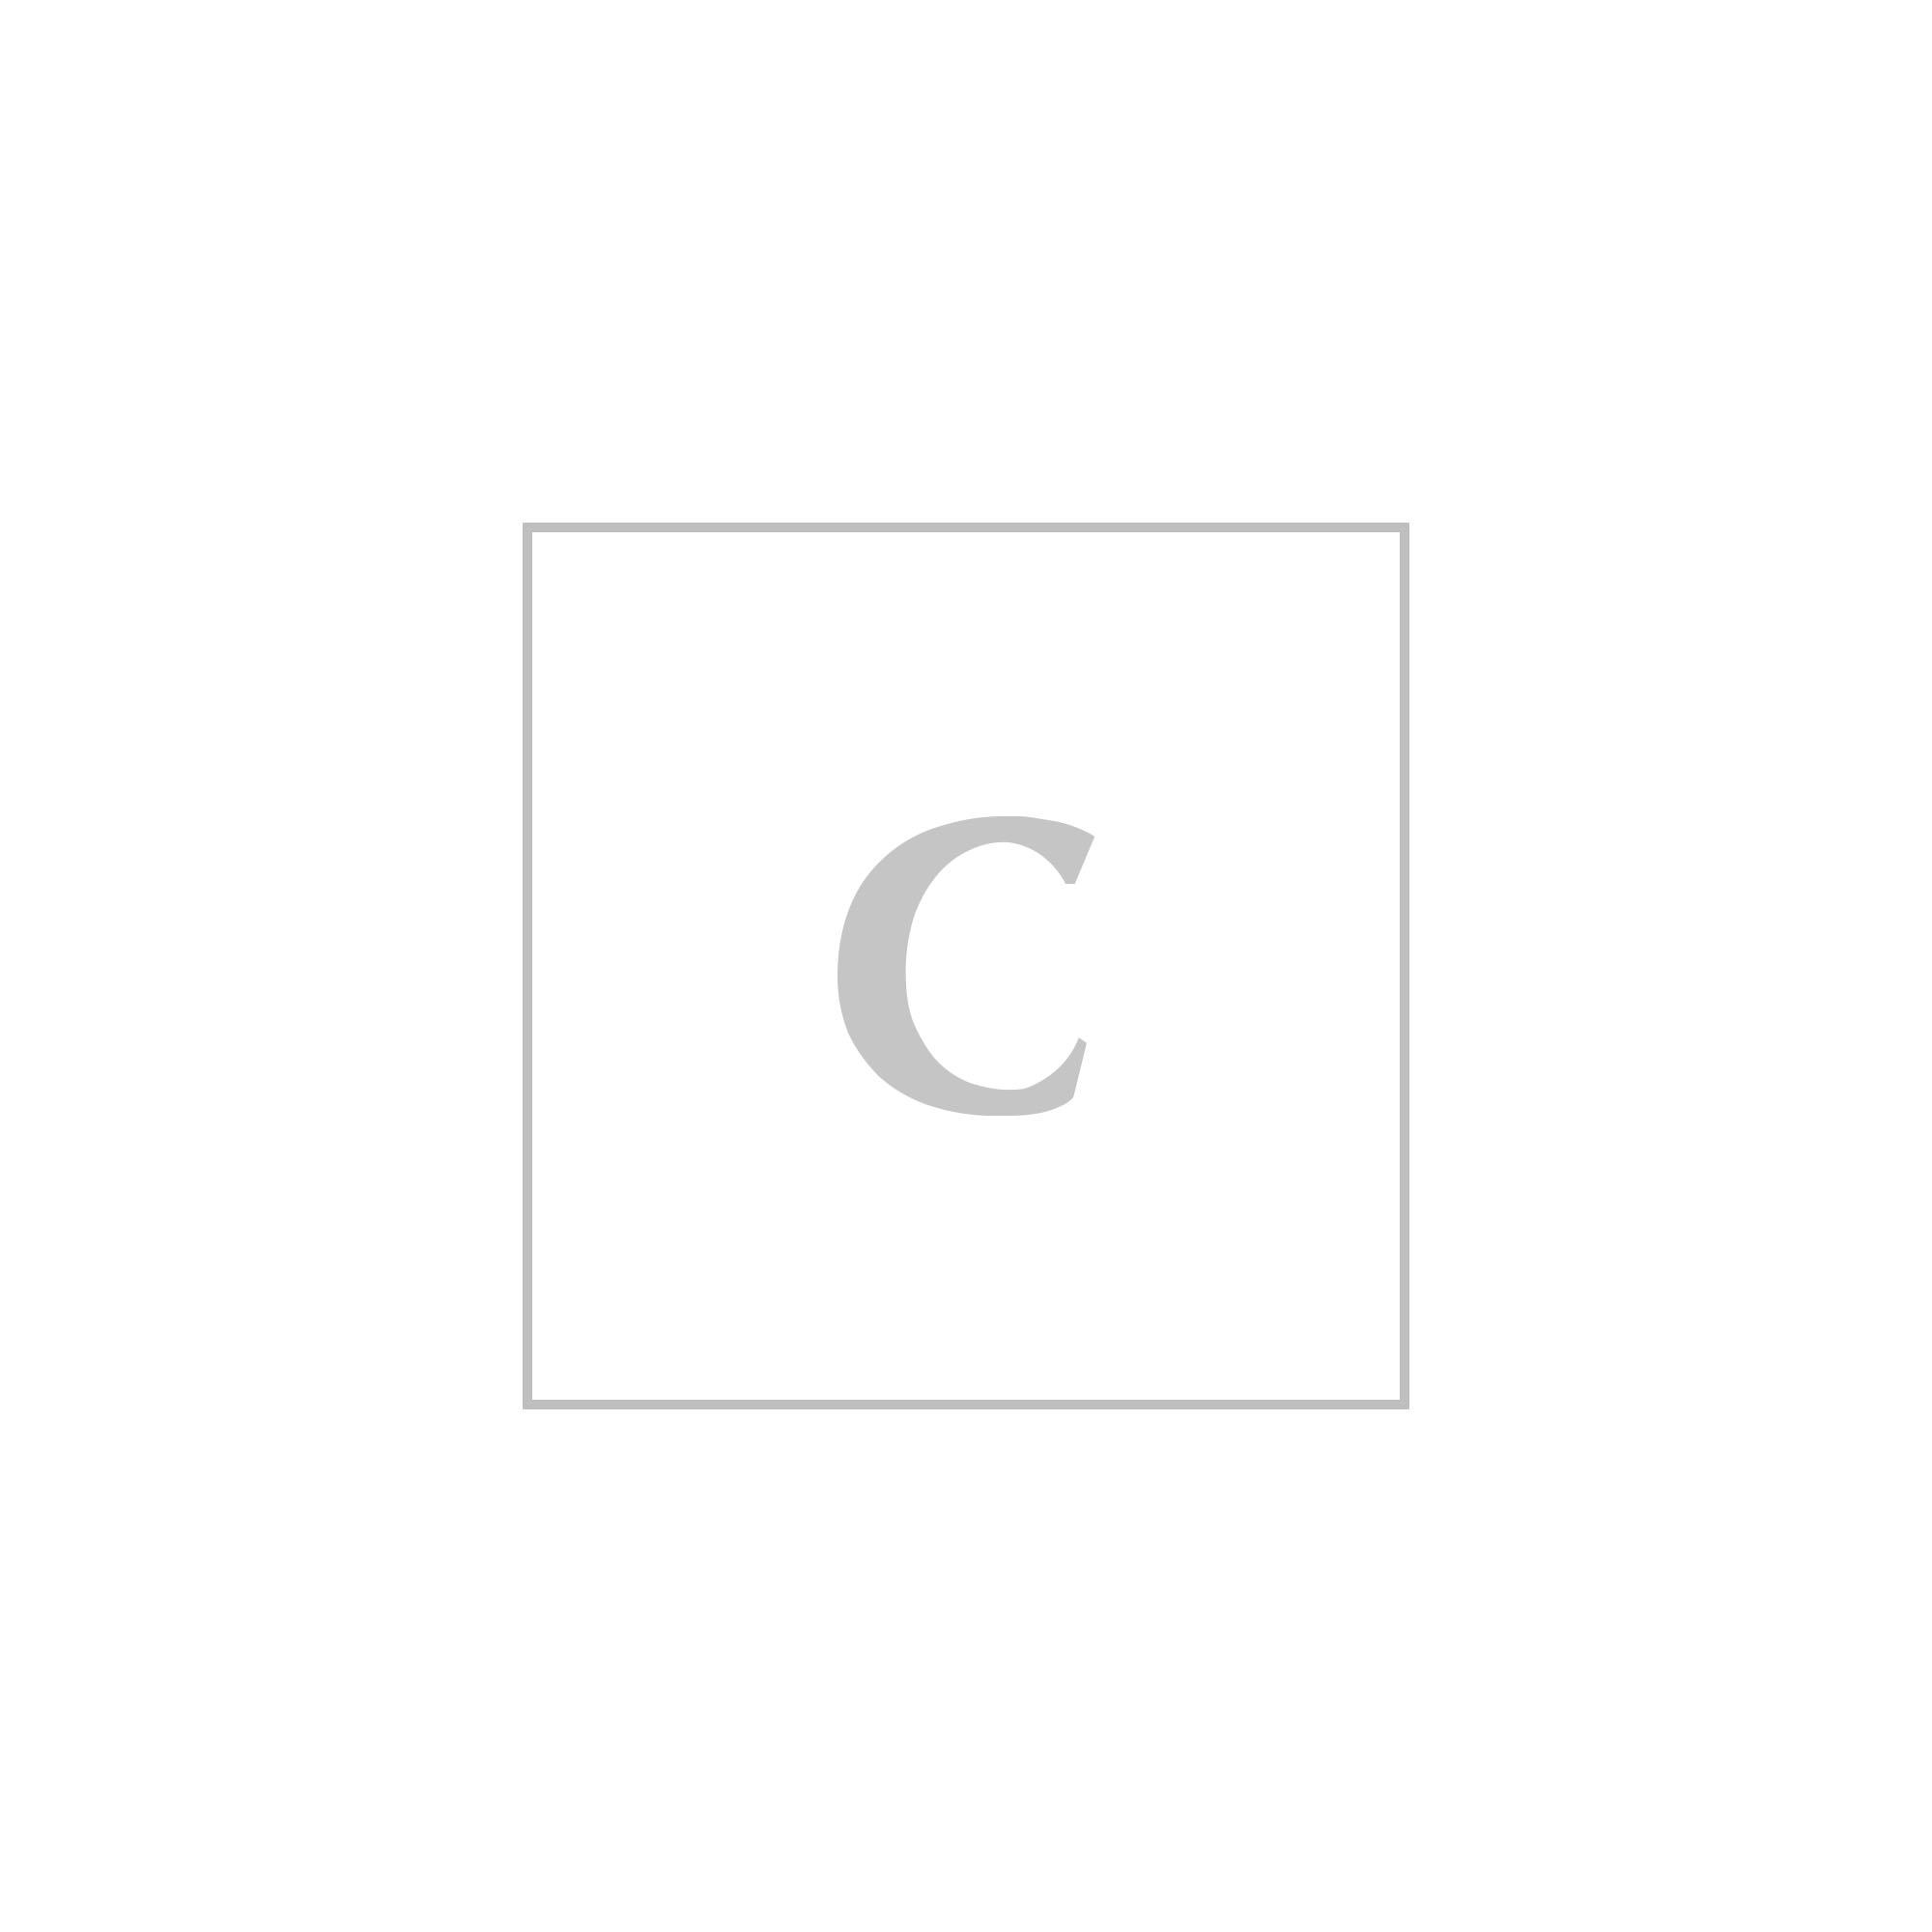 Dolce & gabbana zaino nylon canvas cotone dauphine